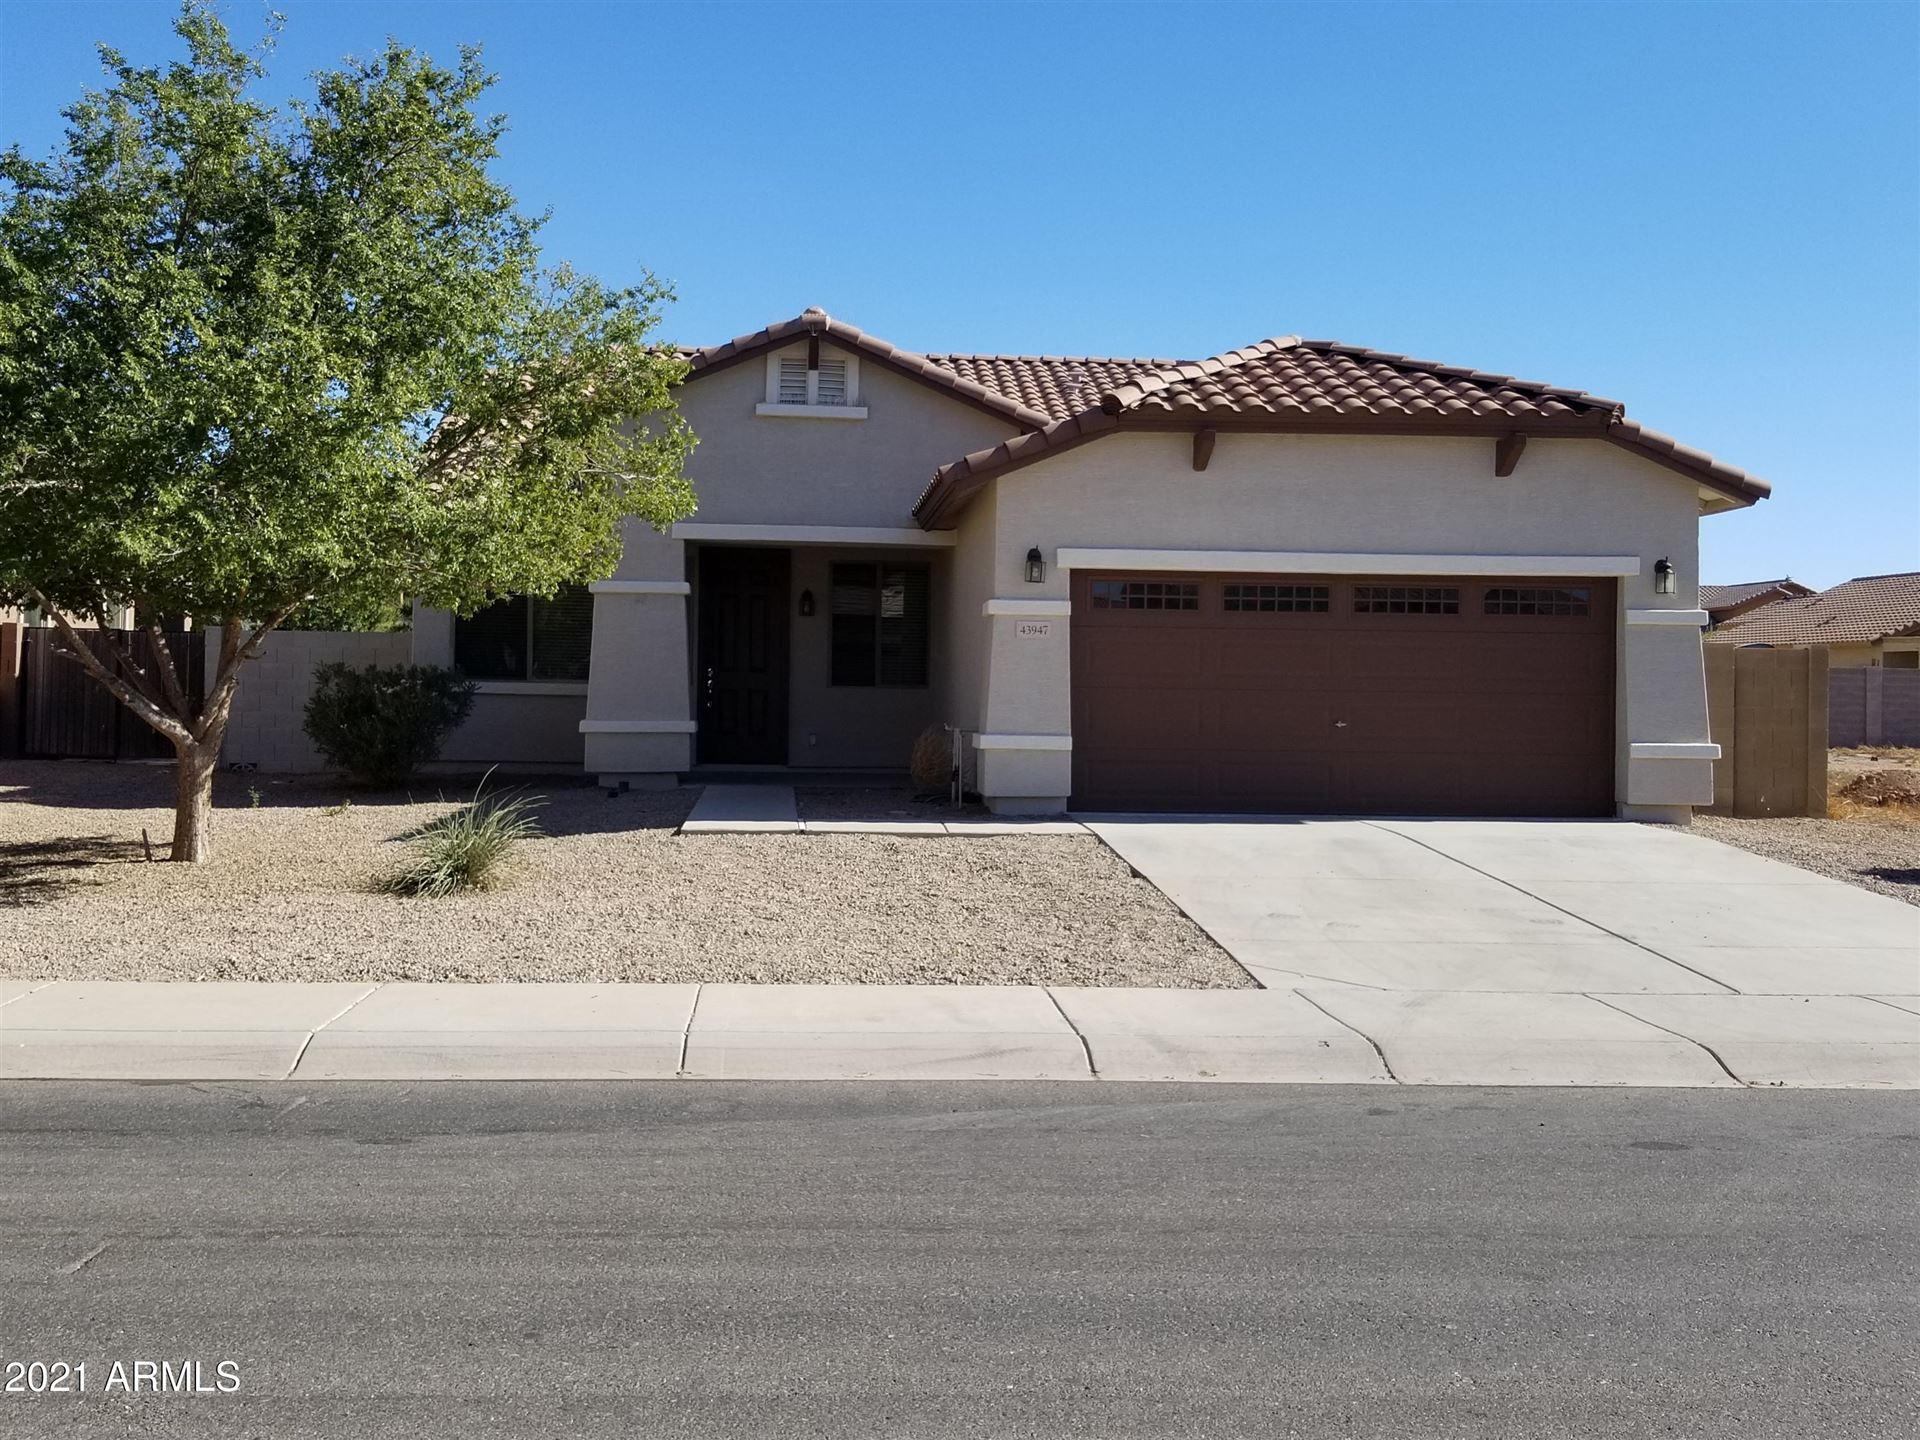 Photo for 43947 W PALO CENIZA Way, Maricopa, AZ 85138 (MLS # 6263199)